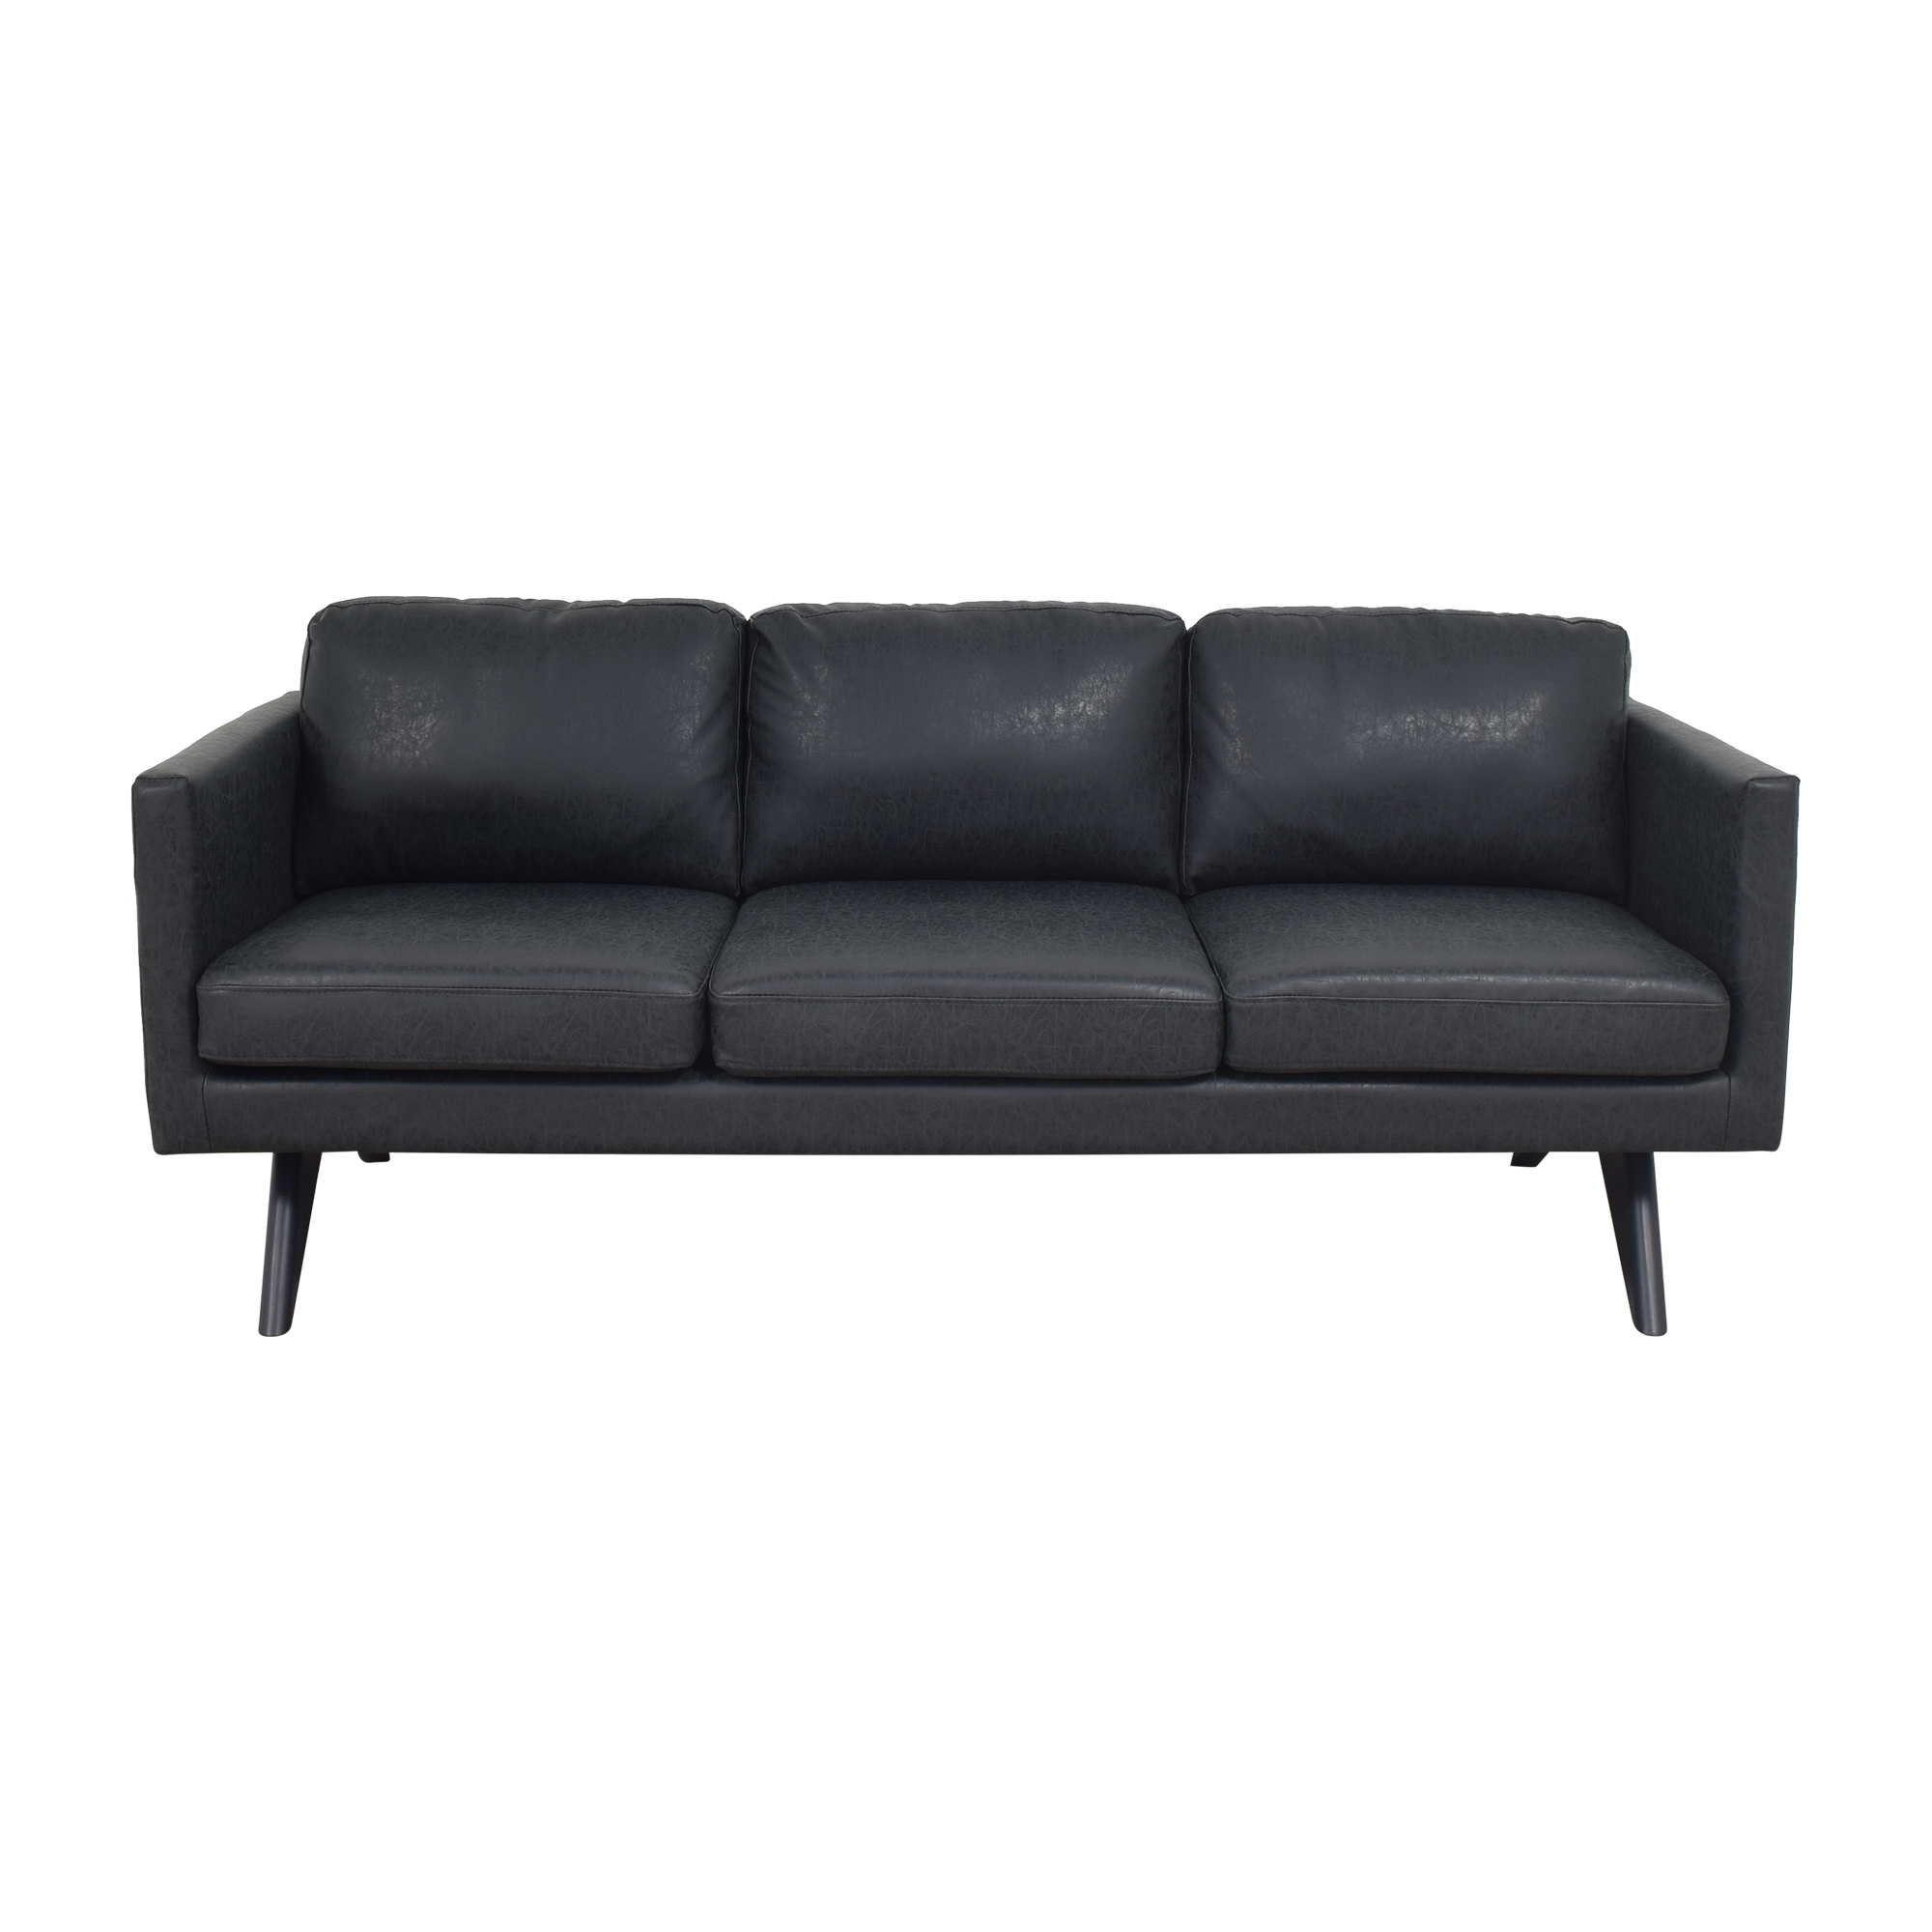 AllModern AllModern Square Arm Sofa second hand